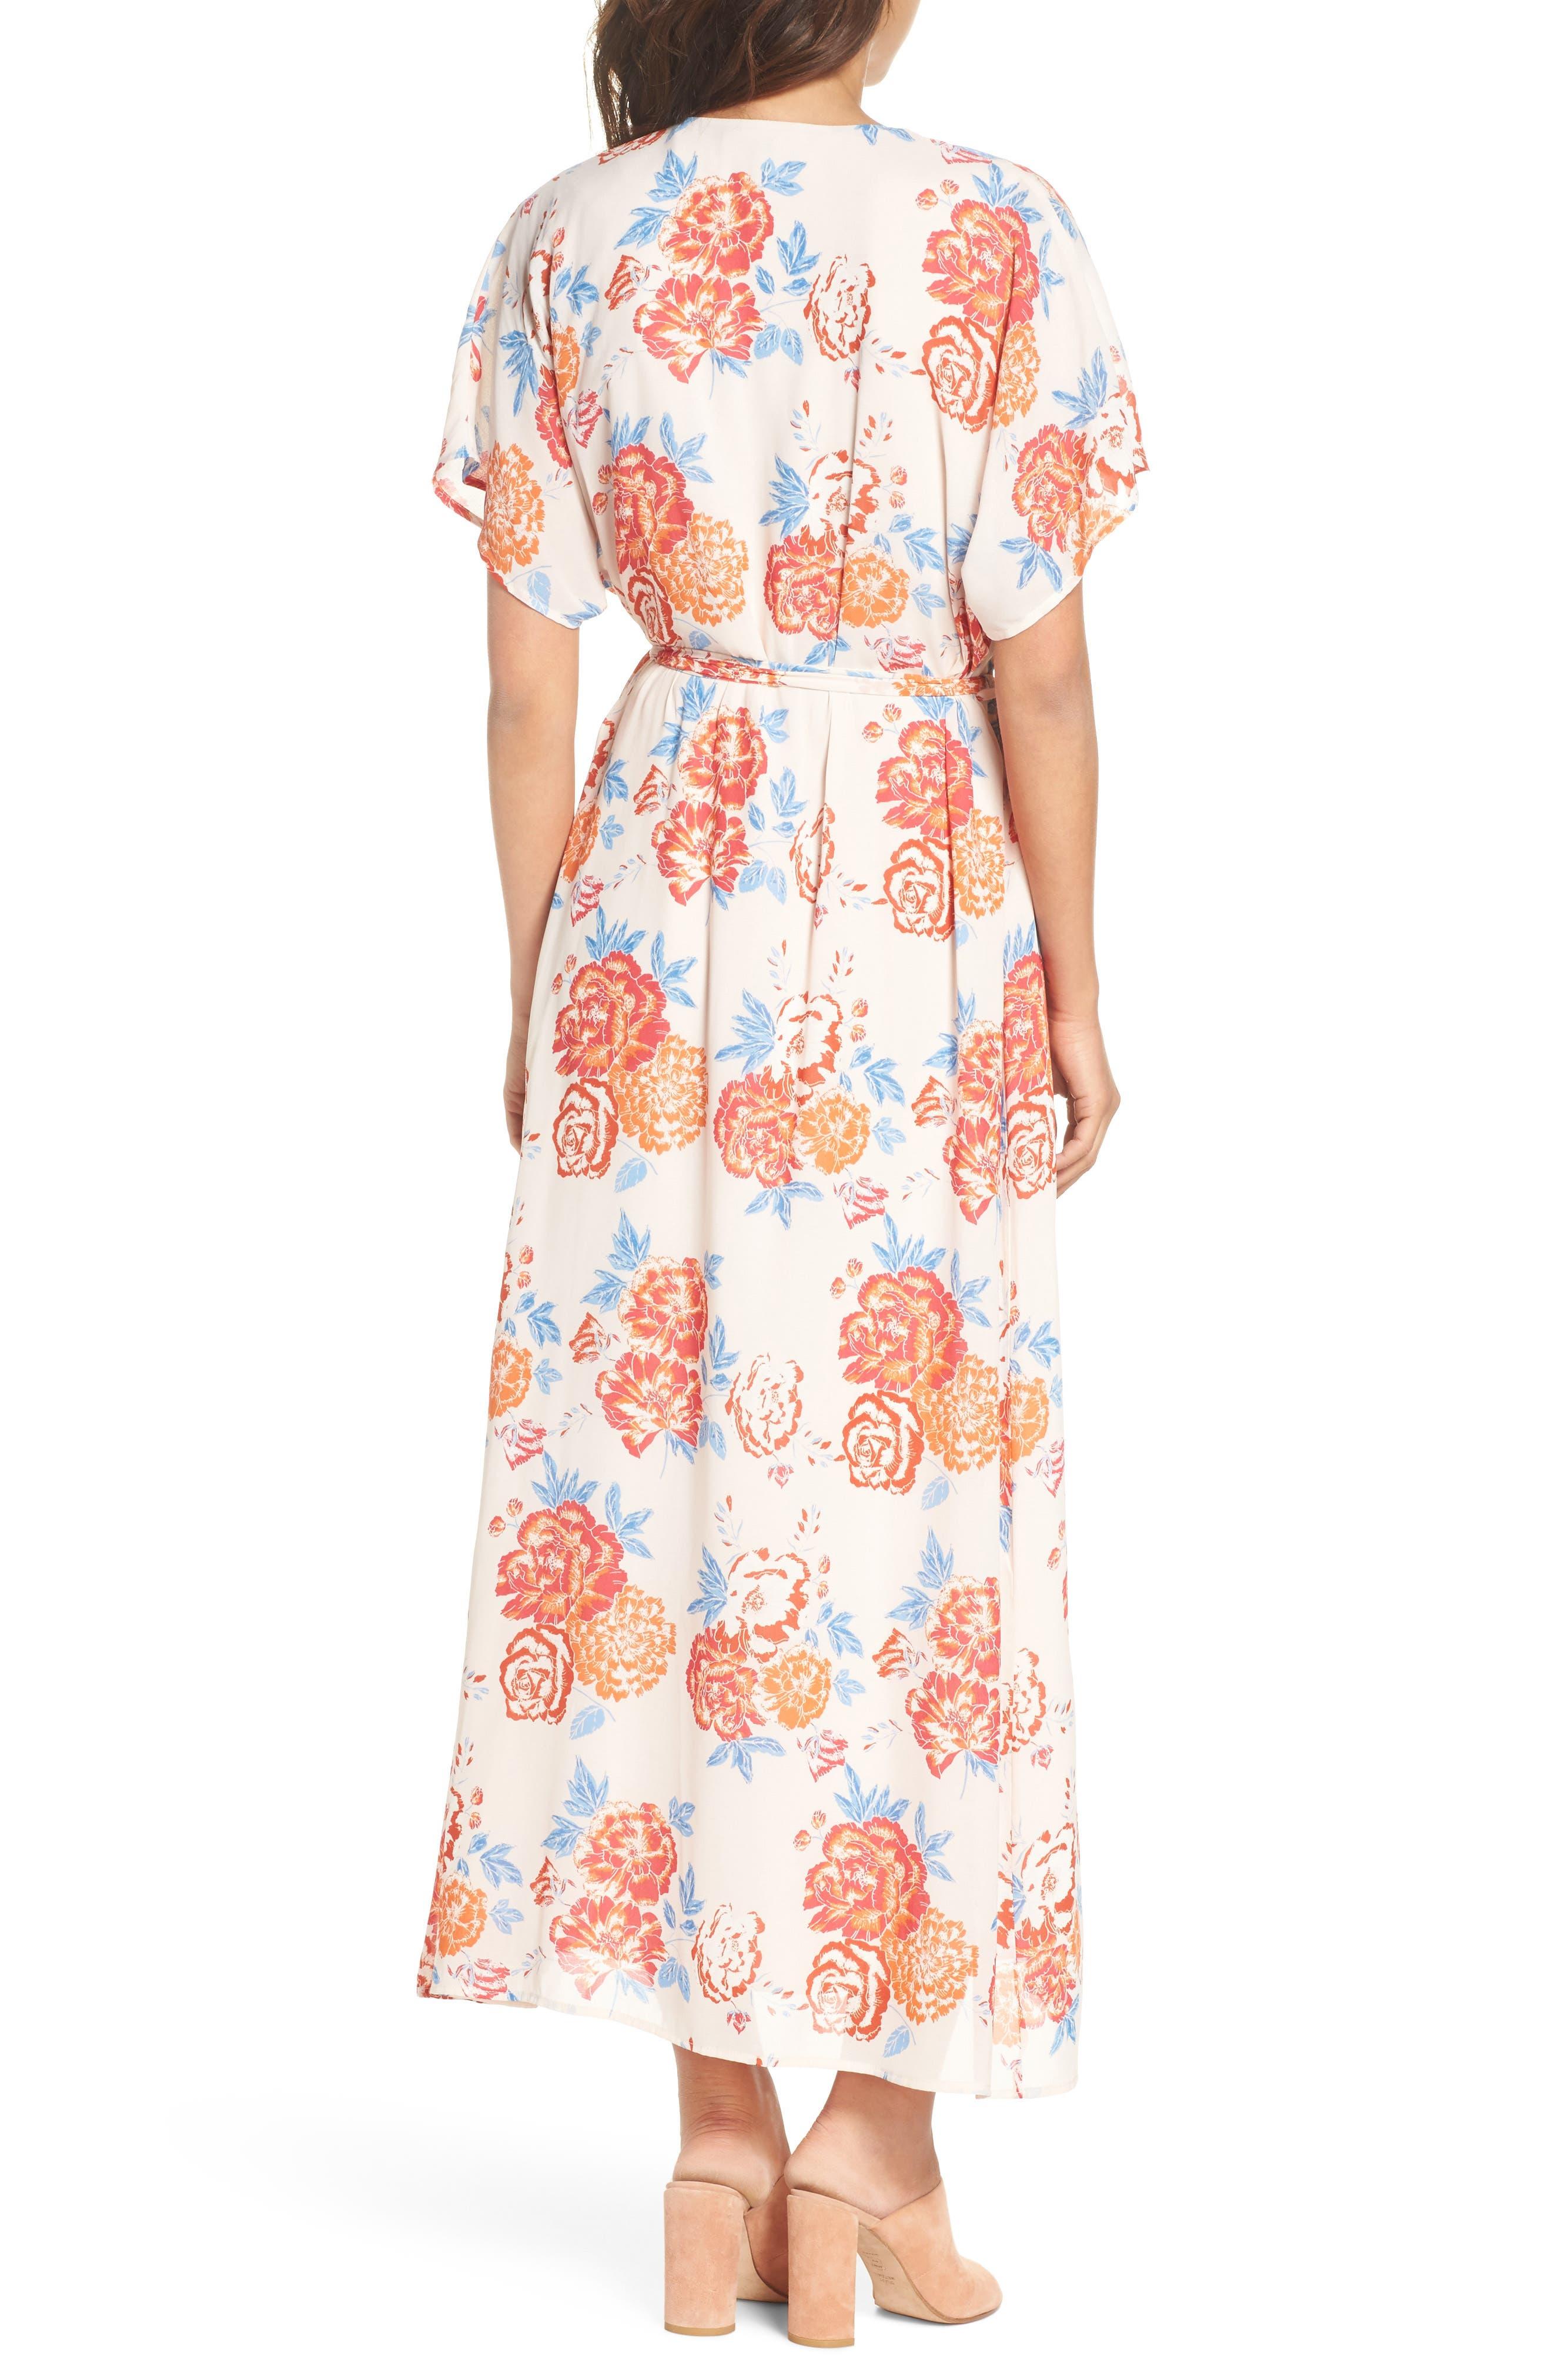 Floral Tie Waist Maxi Dress,                             Alternate thumbnail 2, color,                             Pink/ Coral Multi